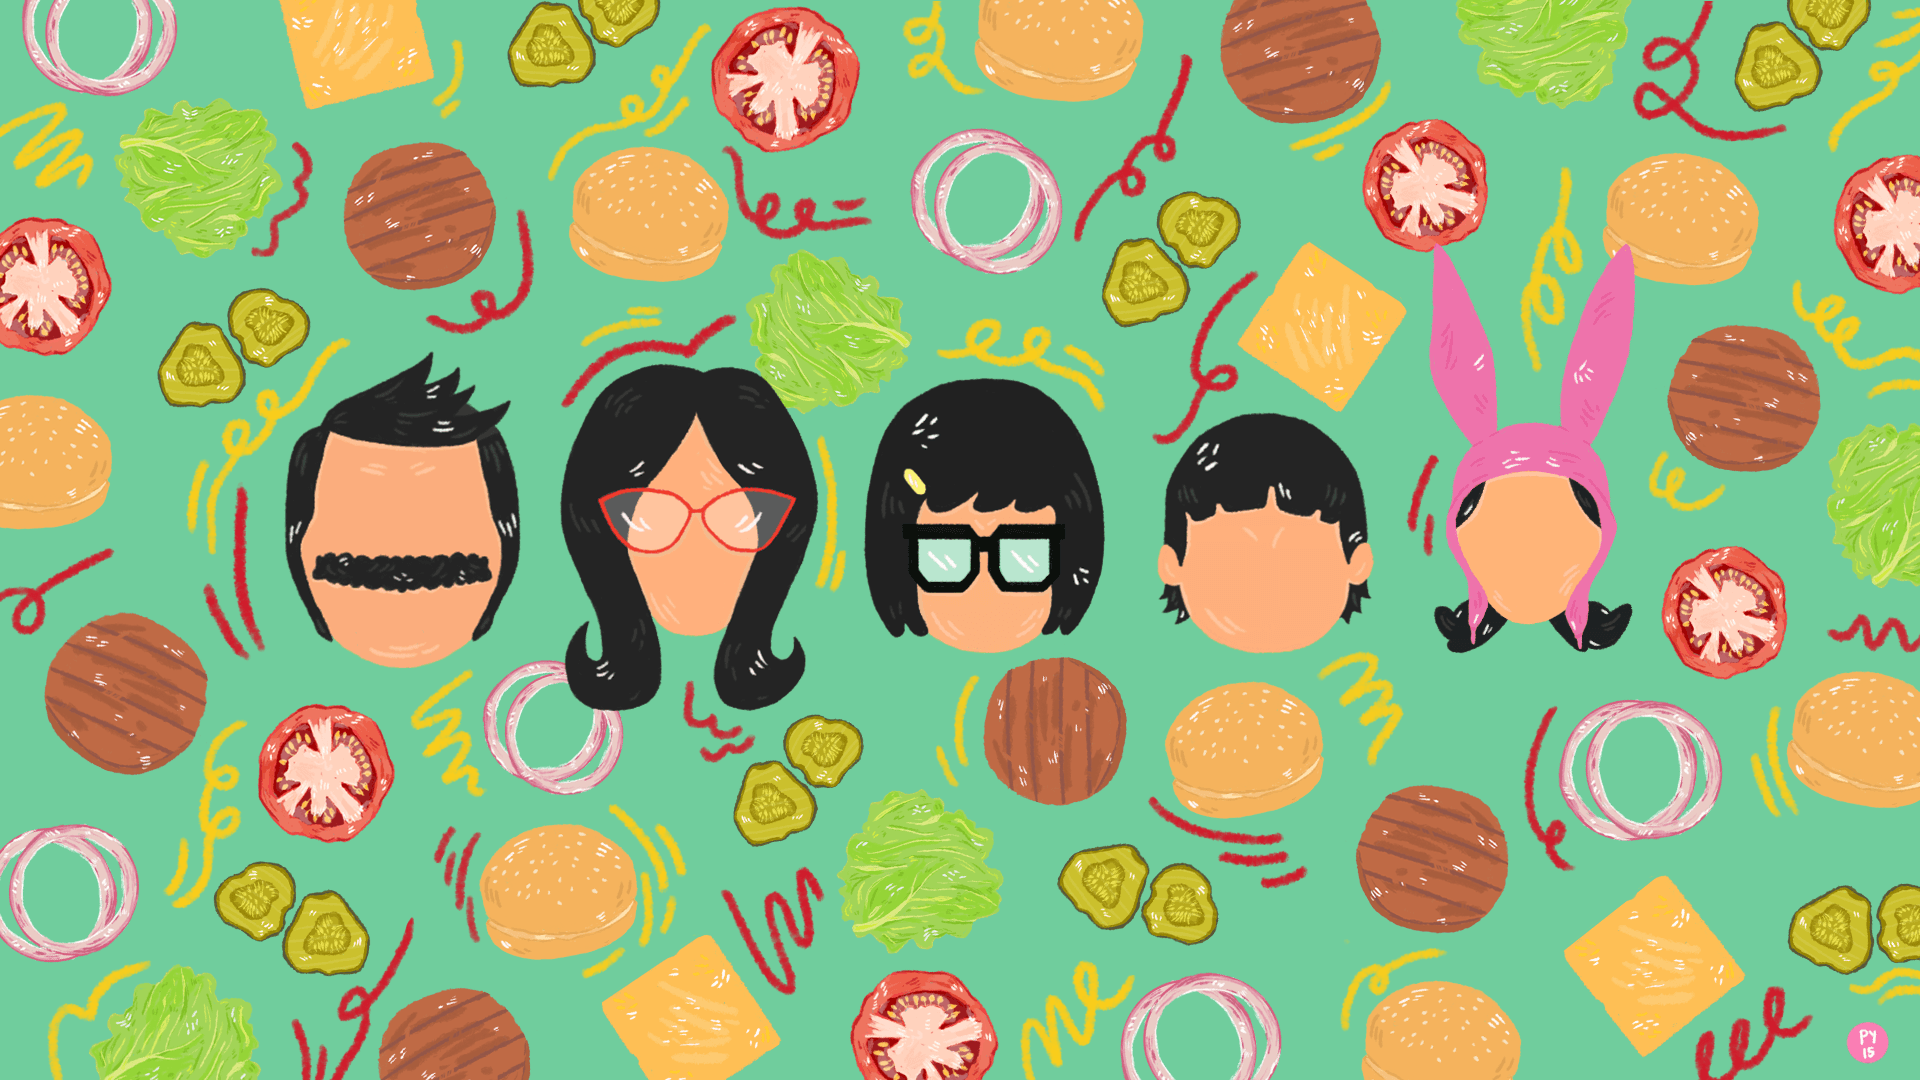 Gravity Falls Minimalist Wallpaper Bob S Burgers Wallpapers Wallpaper Cave